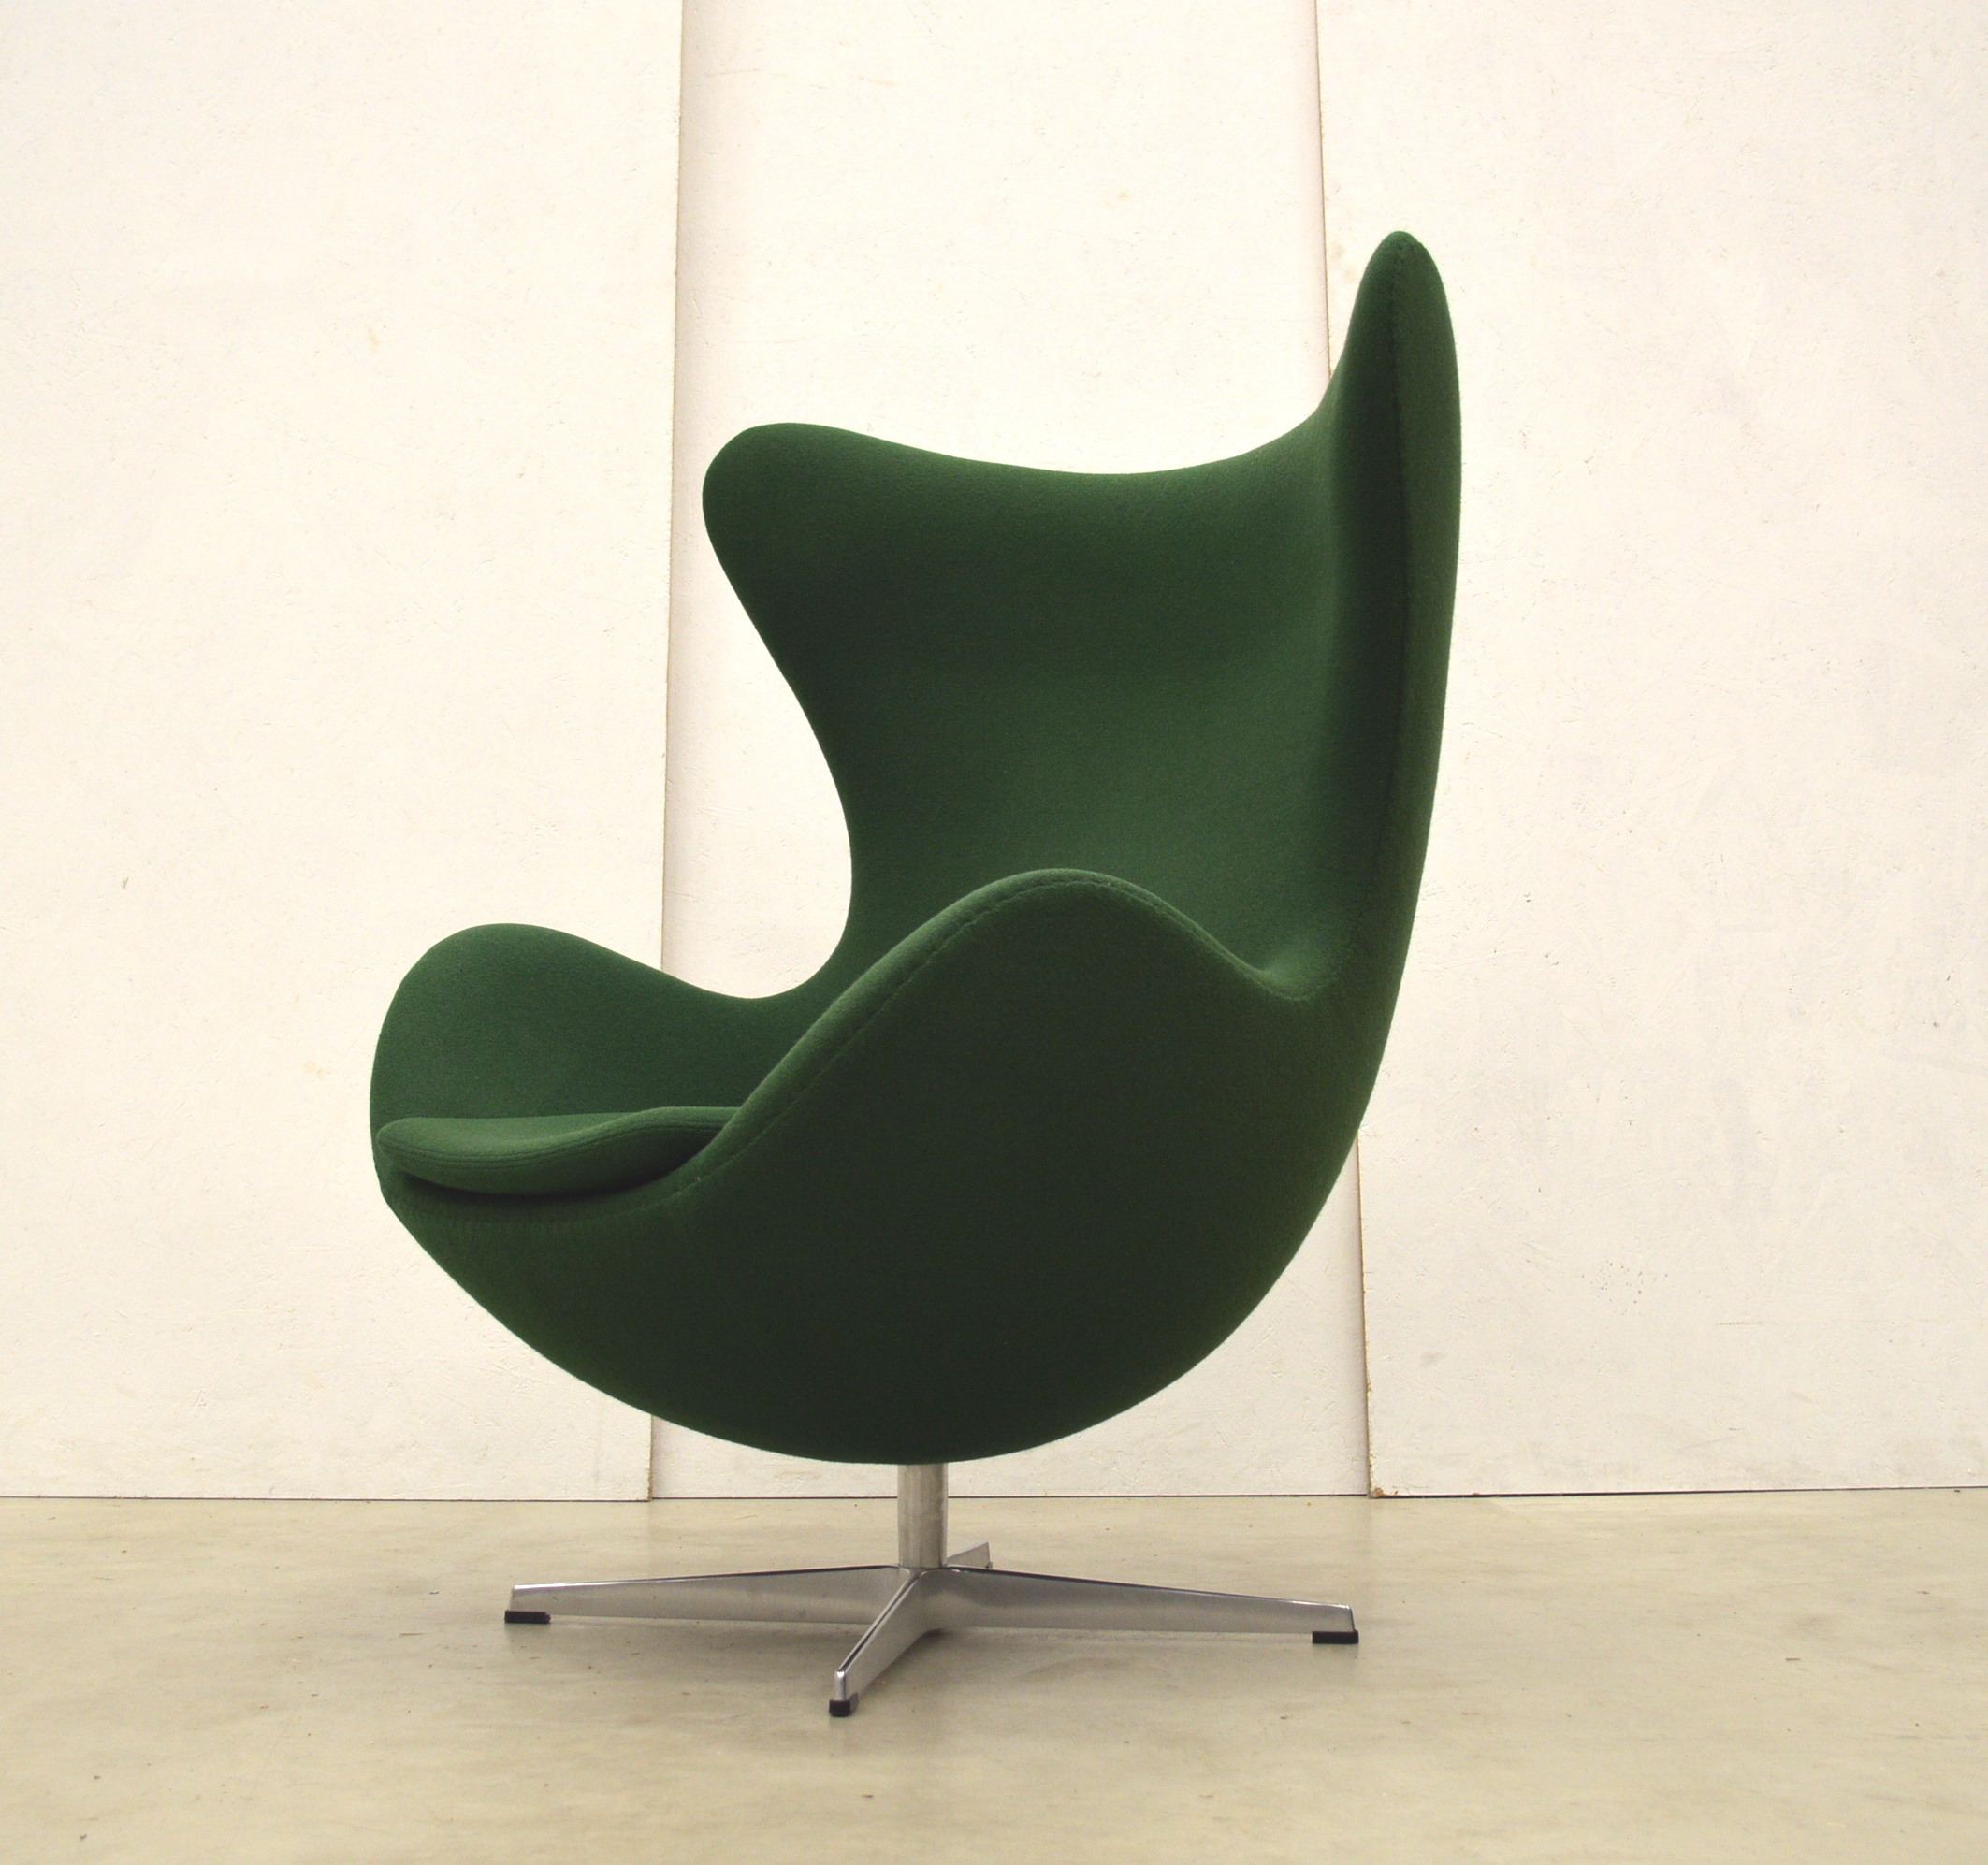 Fritz Hansen Egg Chair By Arne Jacobsen Green Edition Interior Aksel